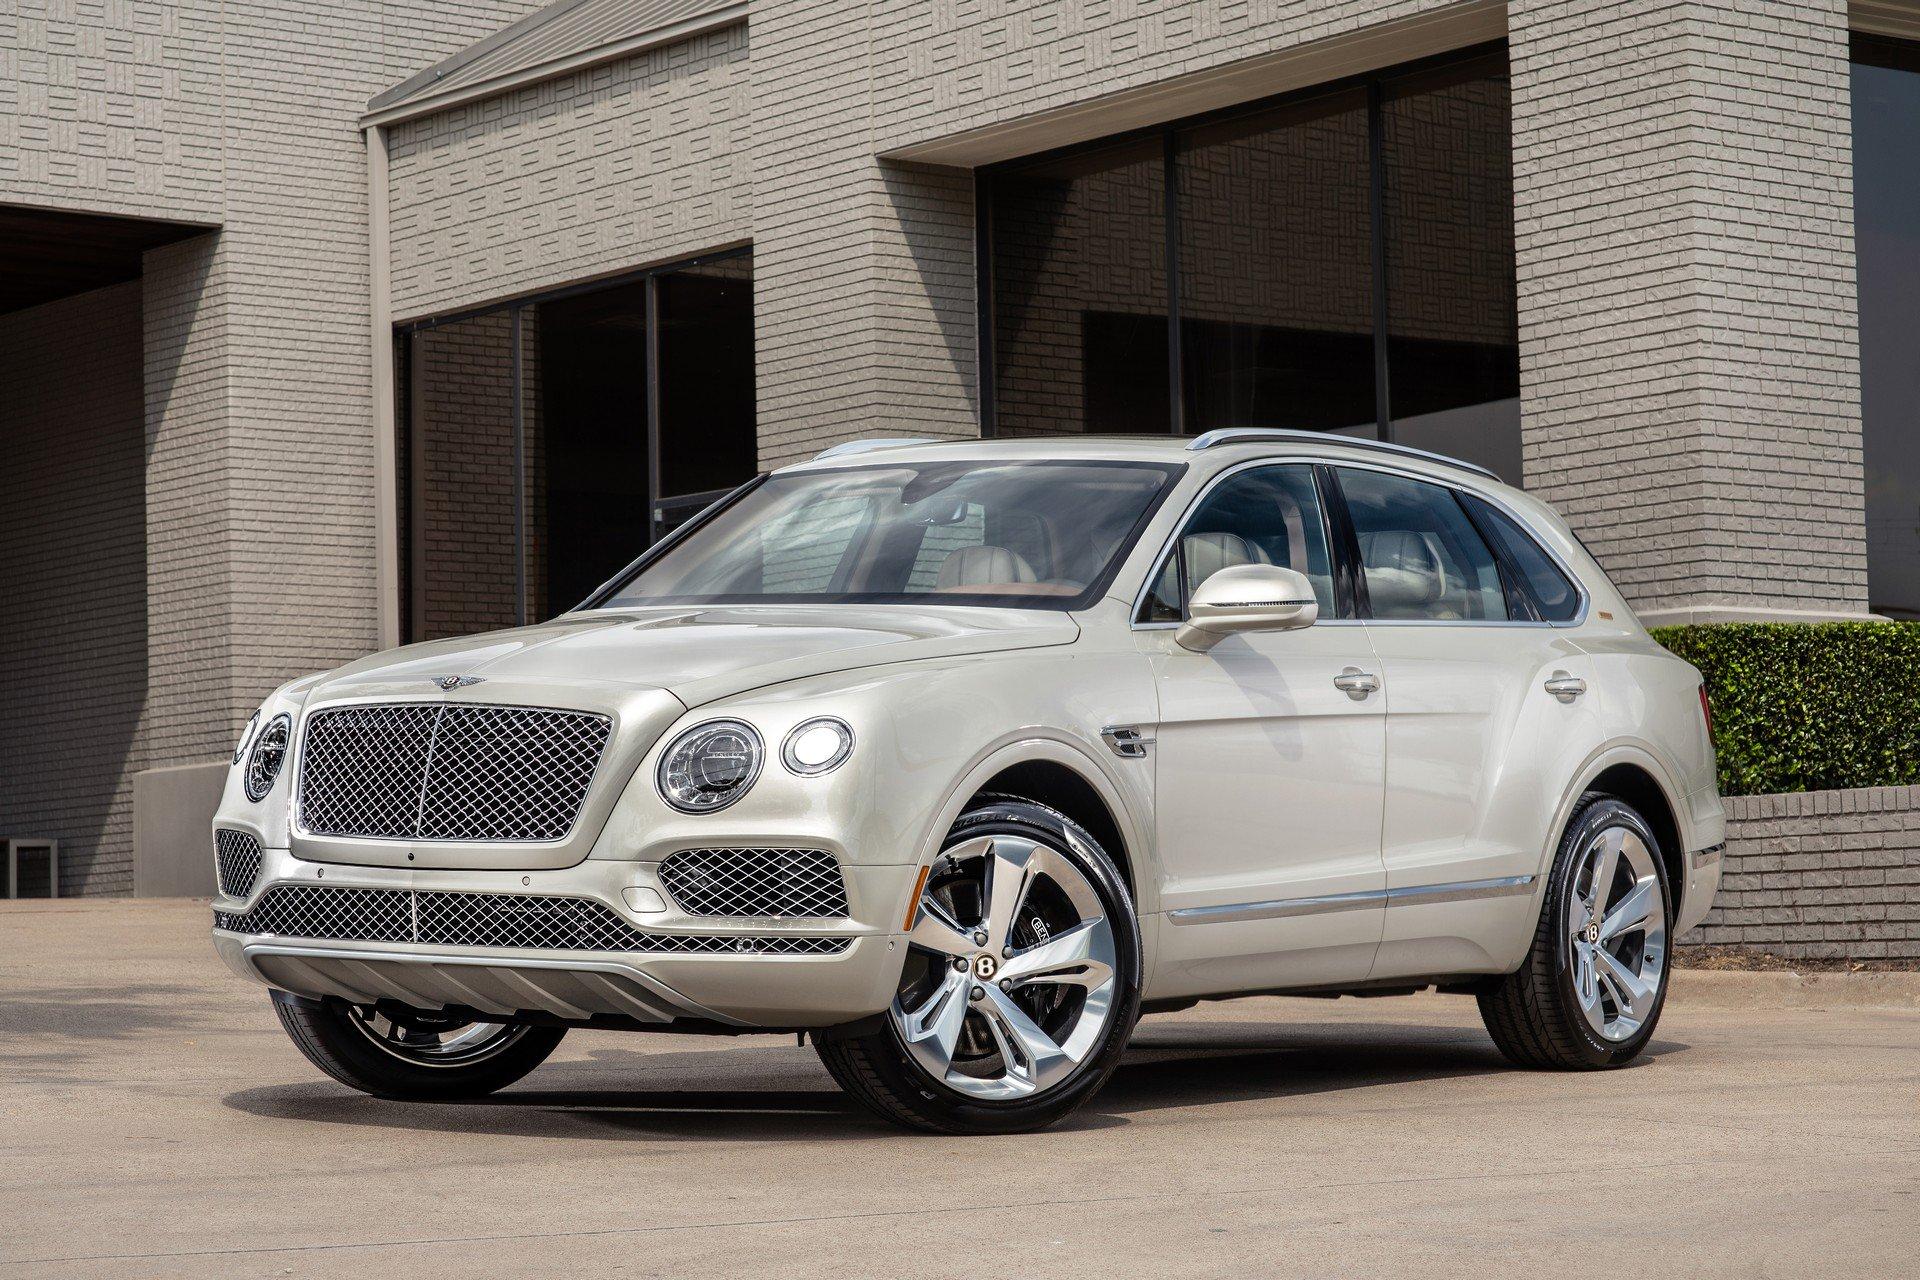 Bentley_Bentayga_Stetson_Edition_0001